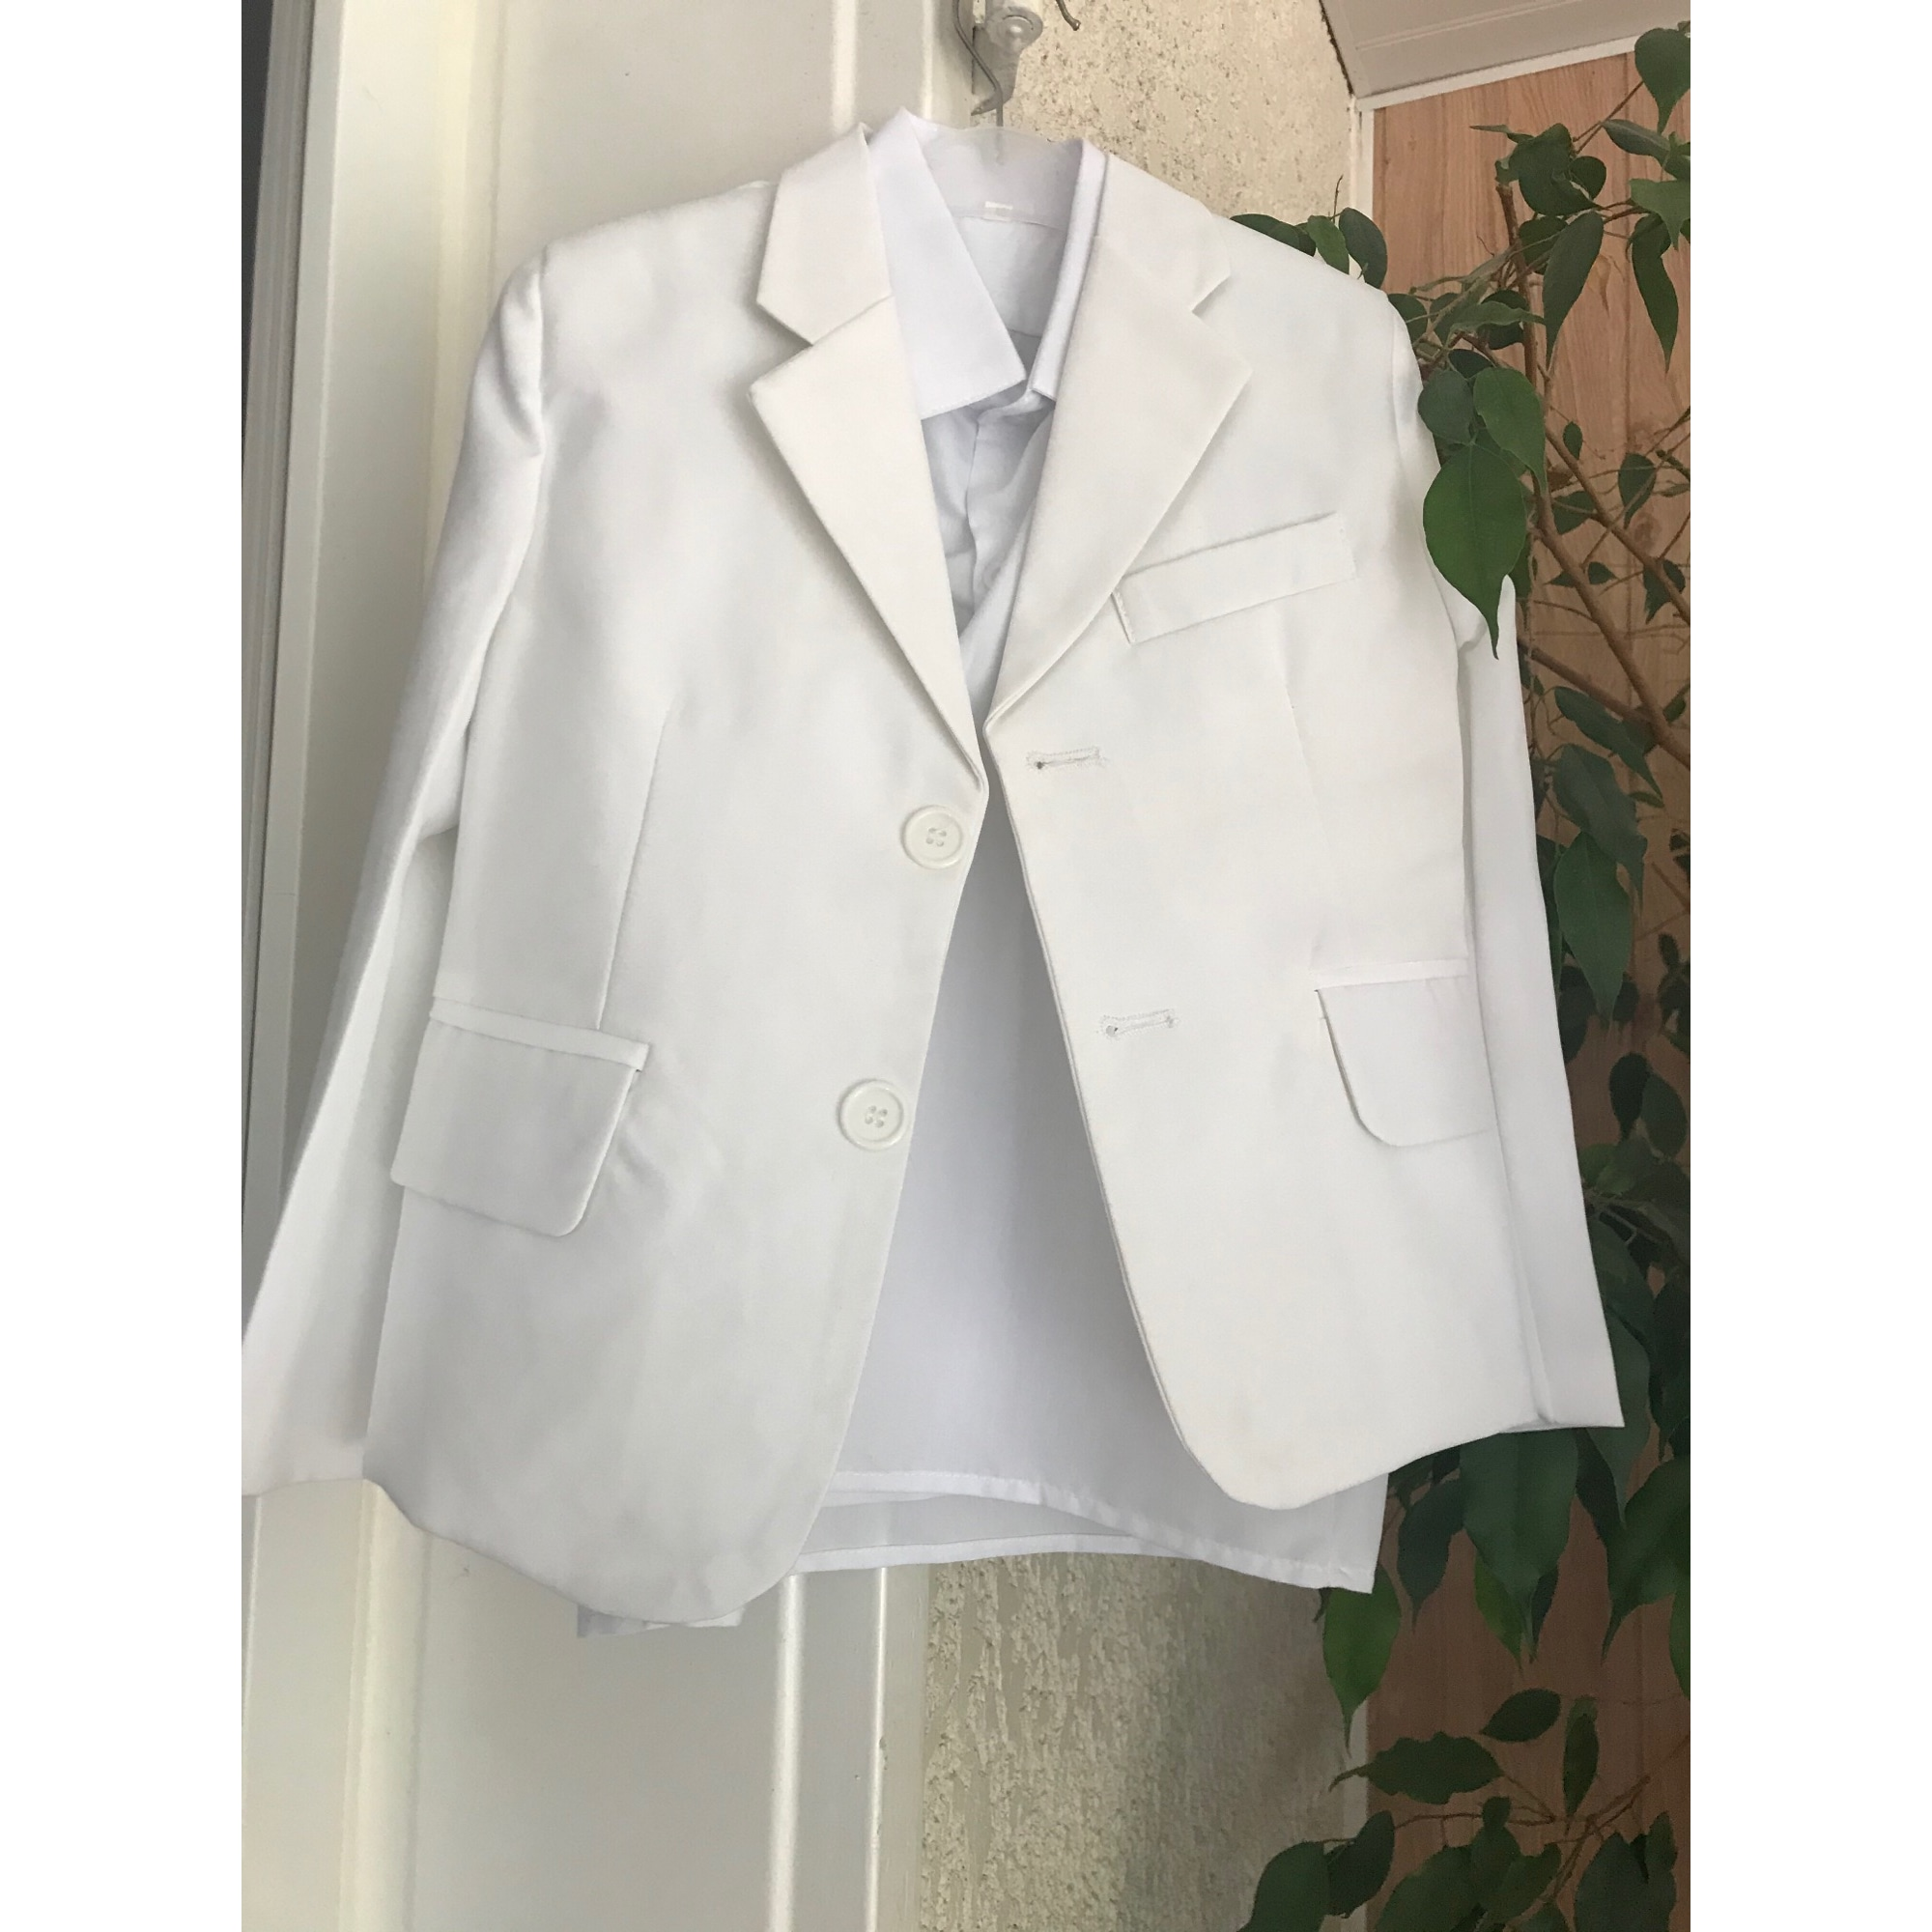 Pants Set, Outfit BOUTIQUE MARIAGE White, off-white, ecru